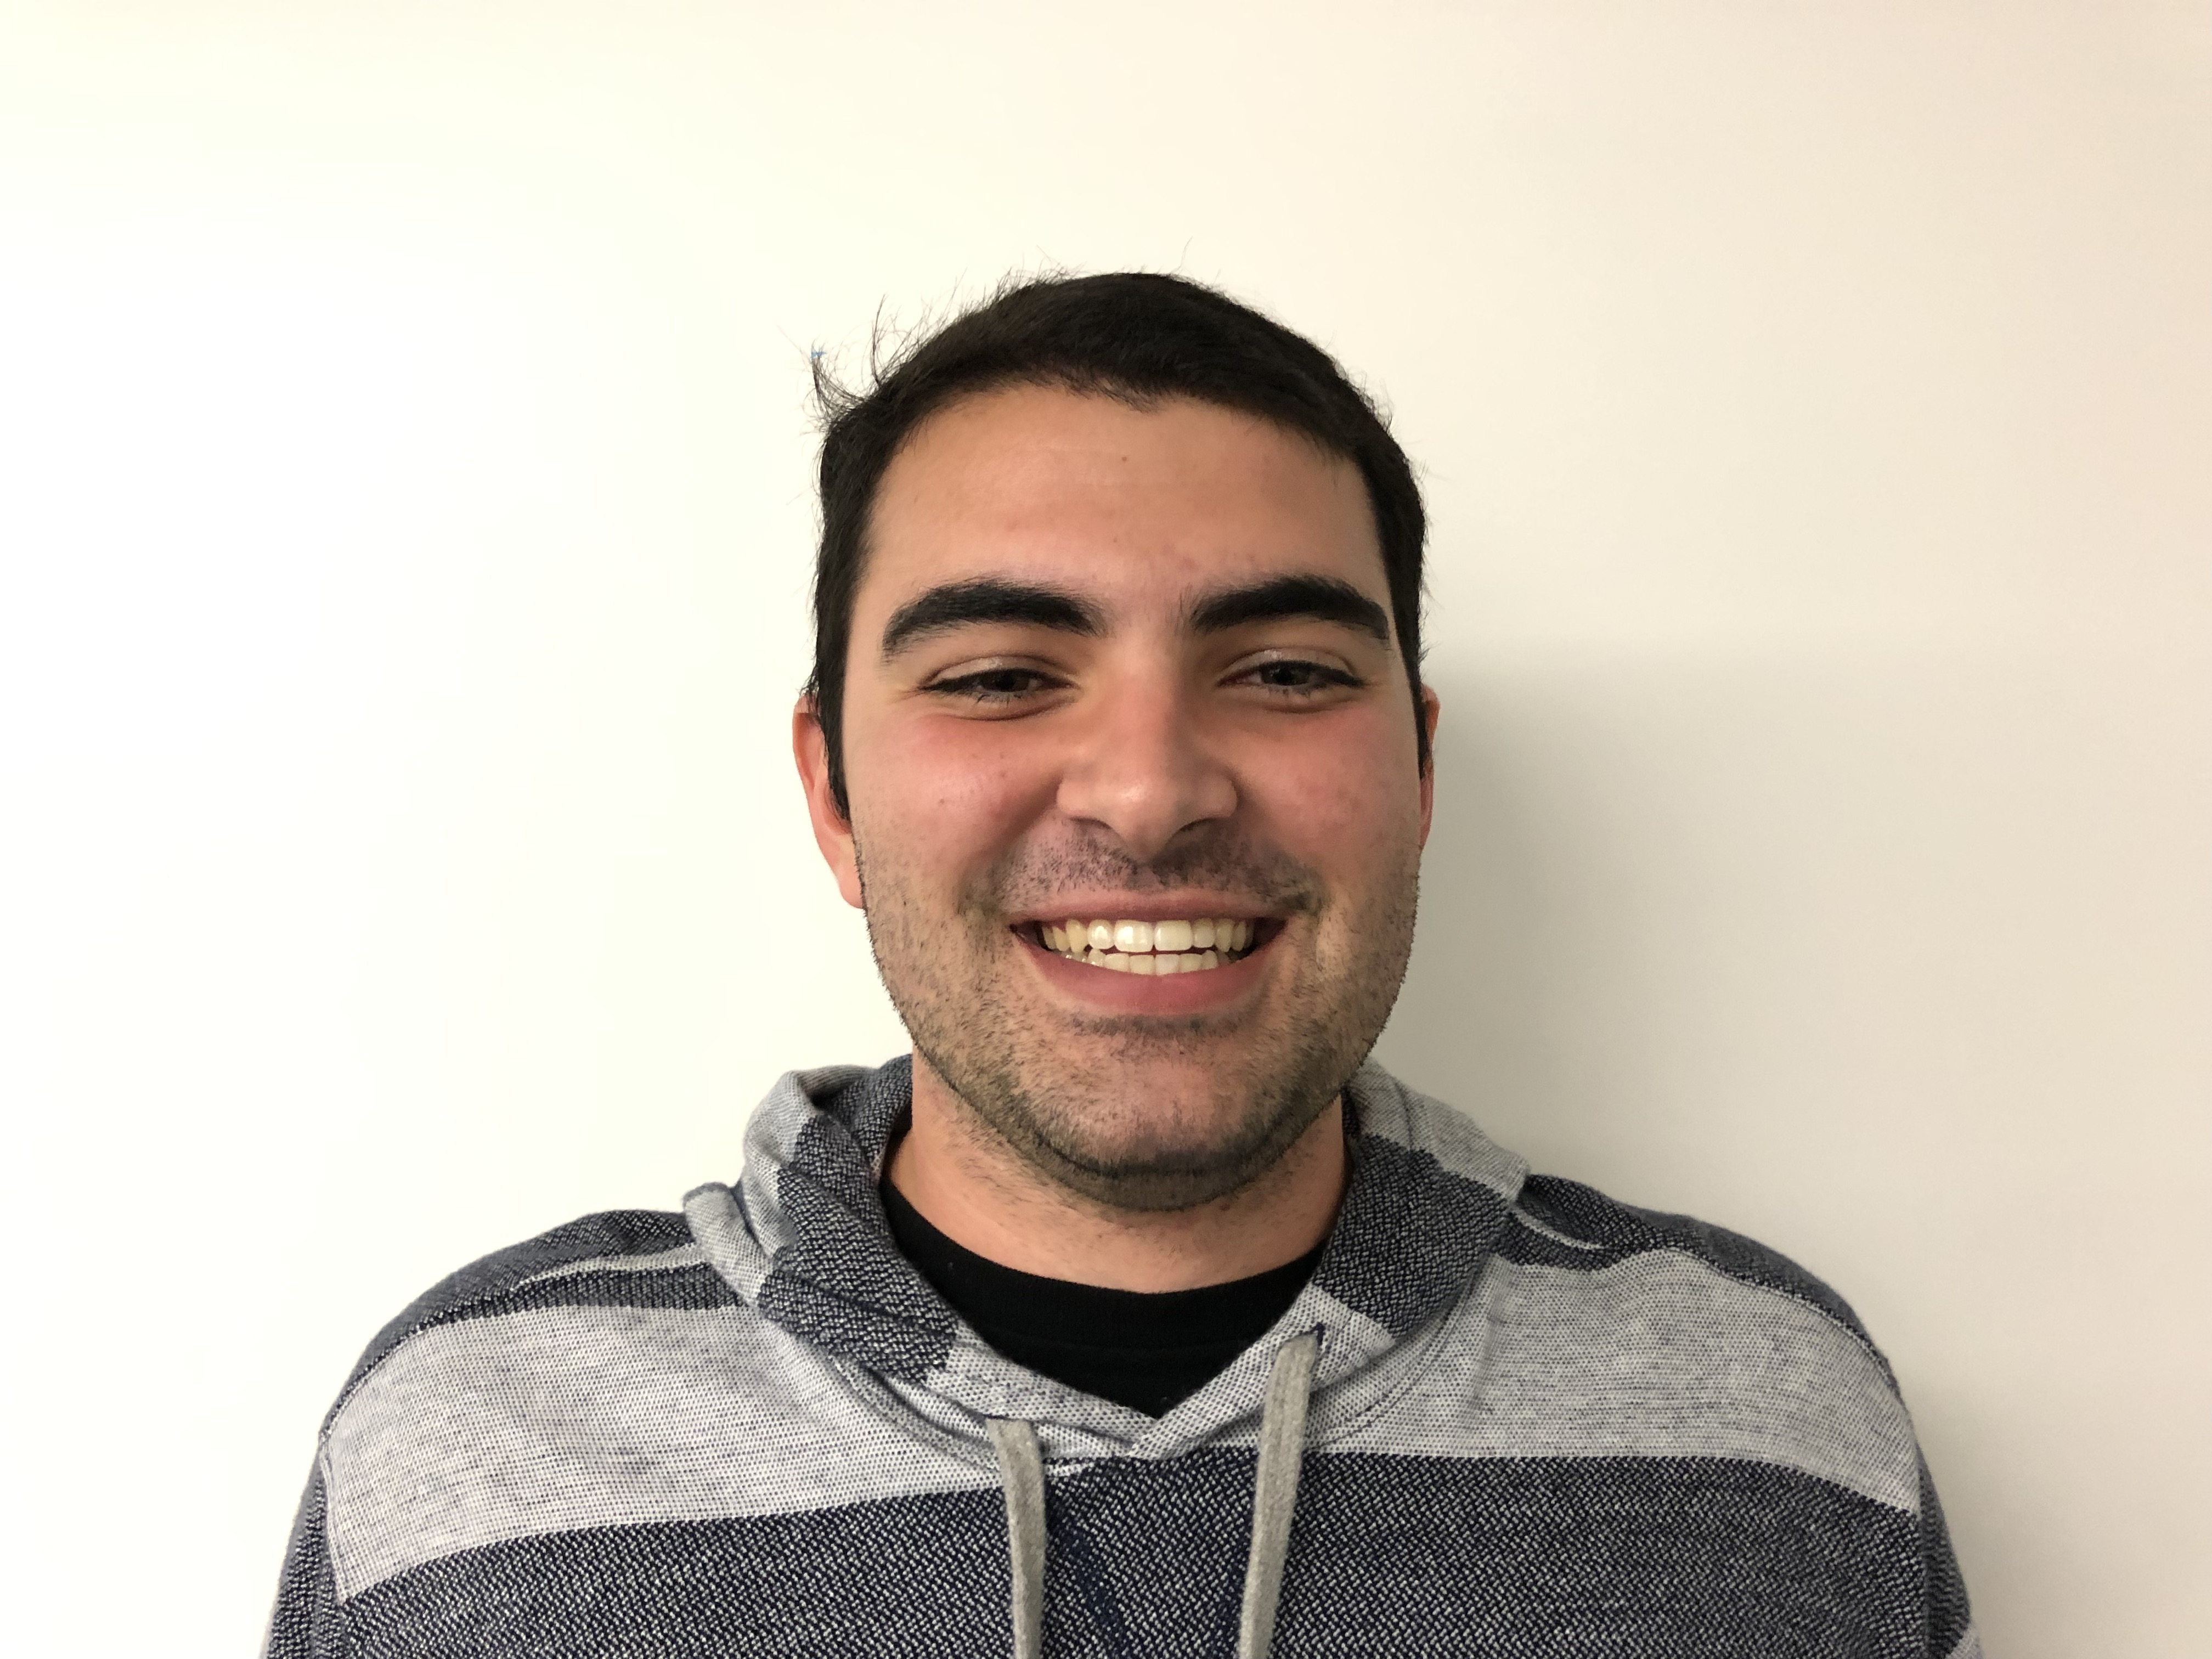 Pepperdine Student Michael Garas